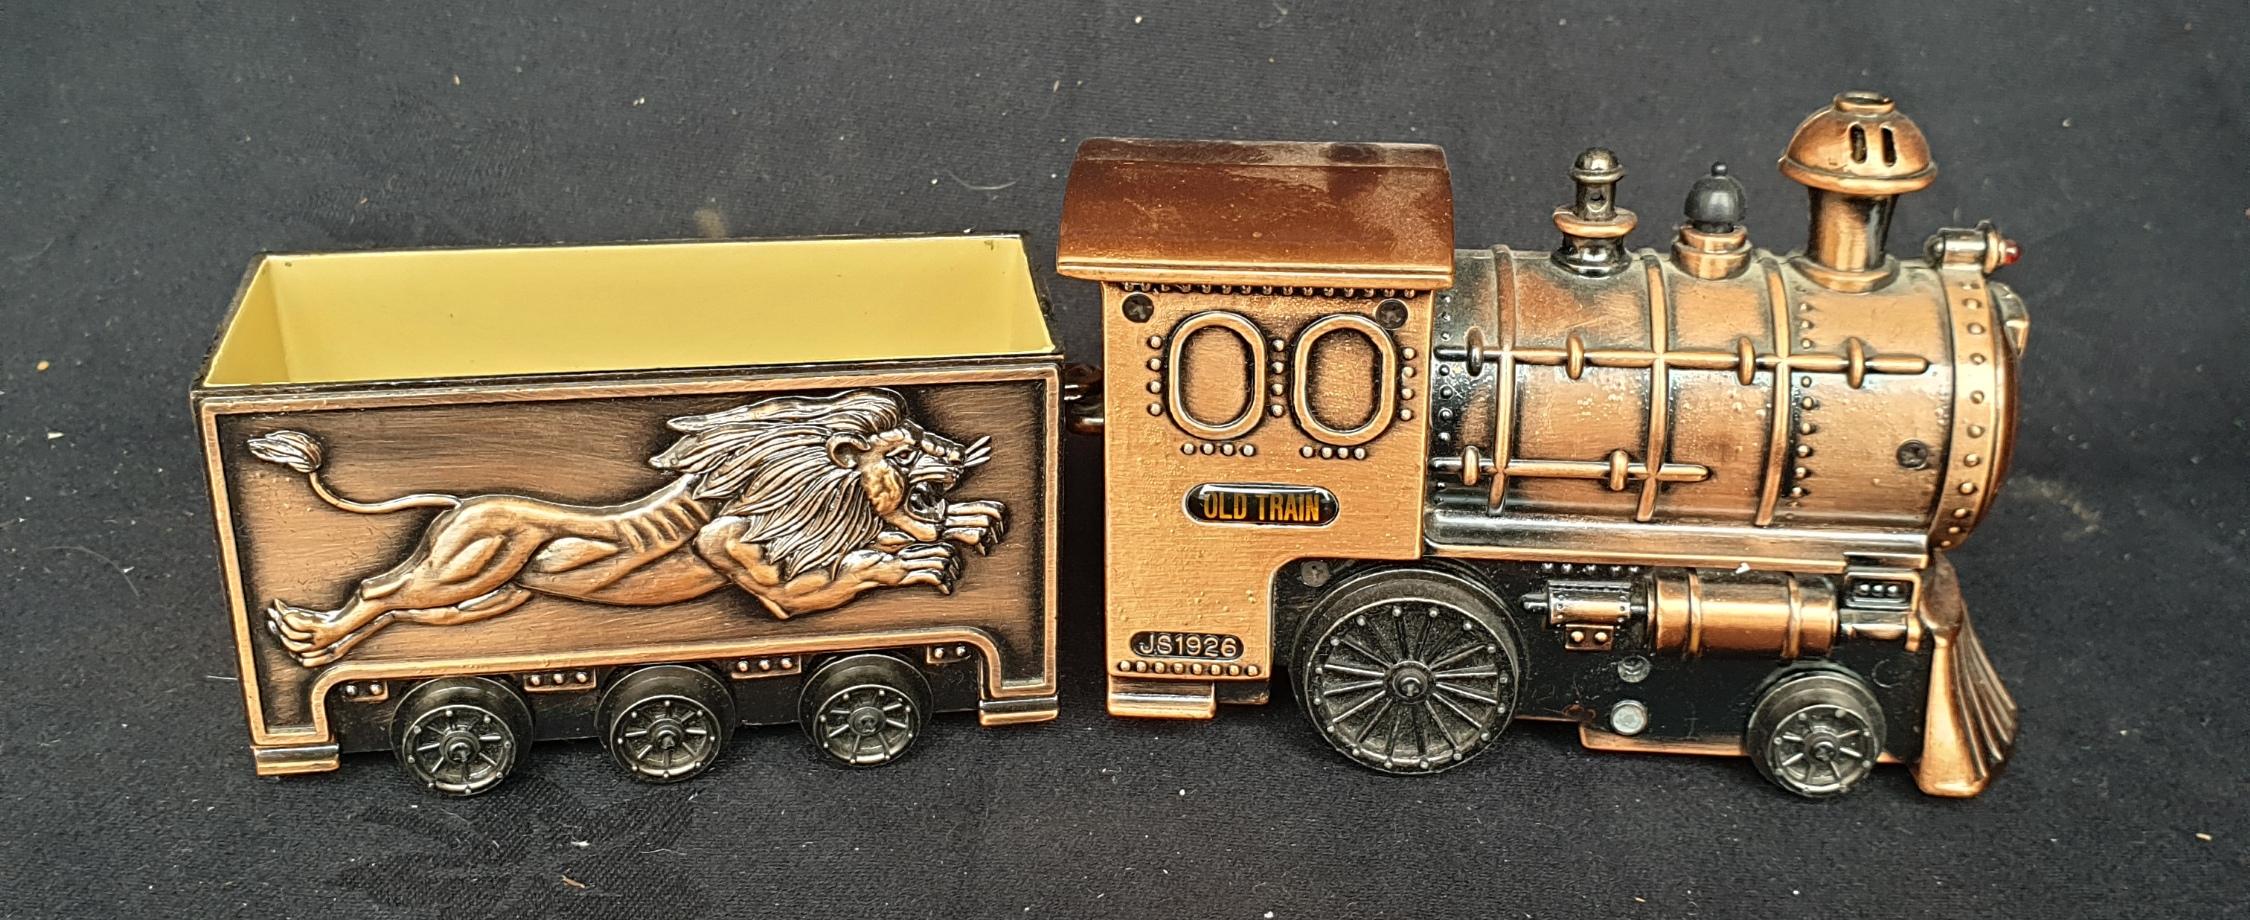 Vintage Train Novelty Table Lighter (A/F) - Image 3 of 3